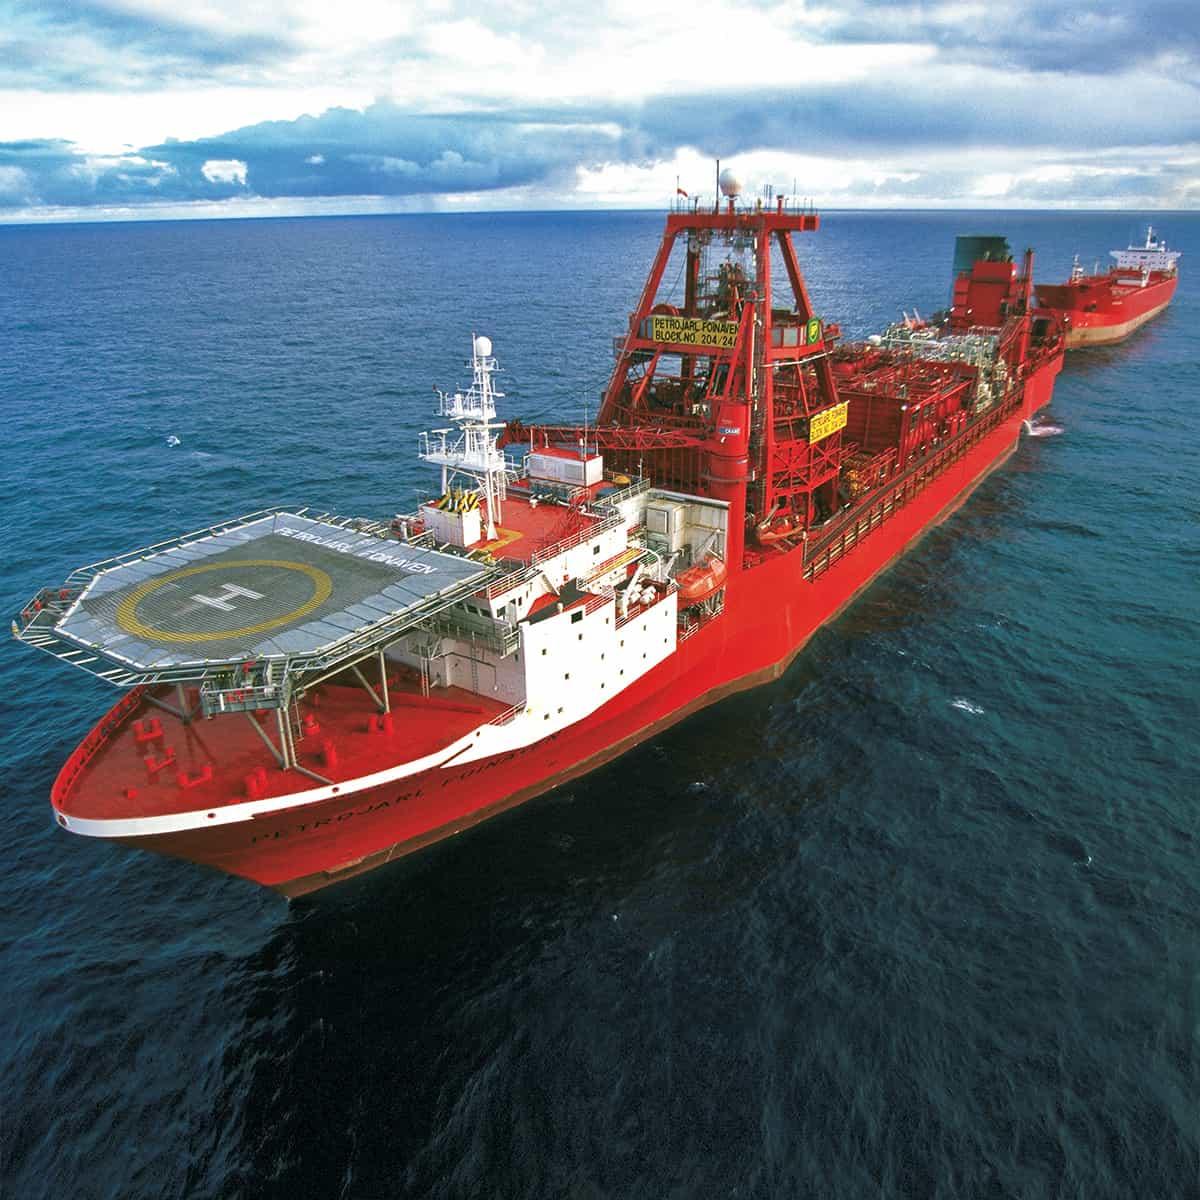 Brannalarm system firealarm detectors flamme detektor offshore FPSO FOINAVEN